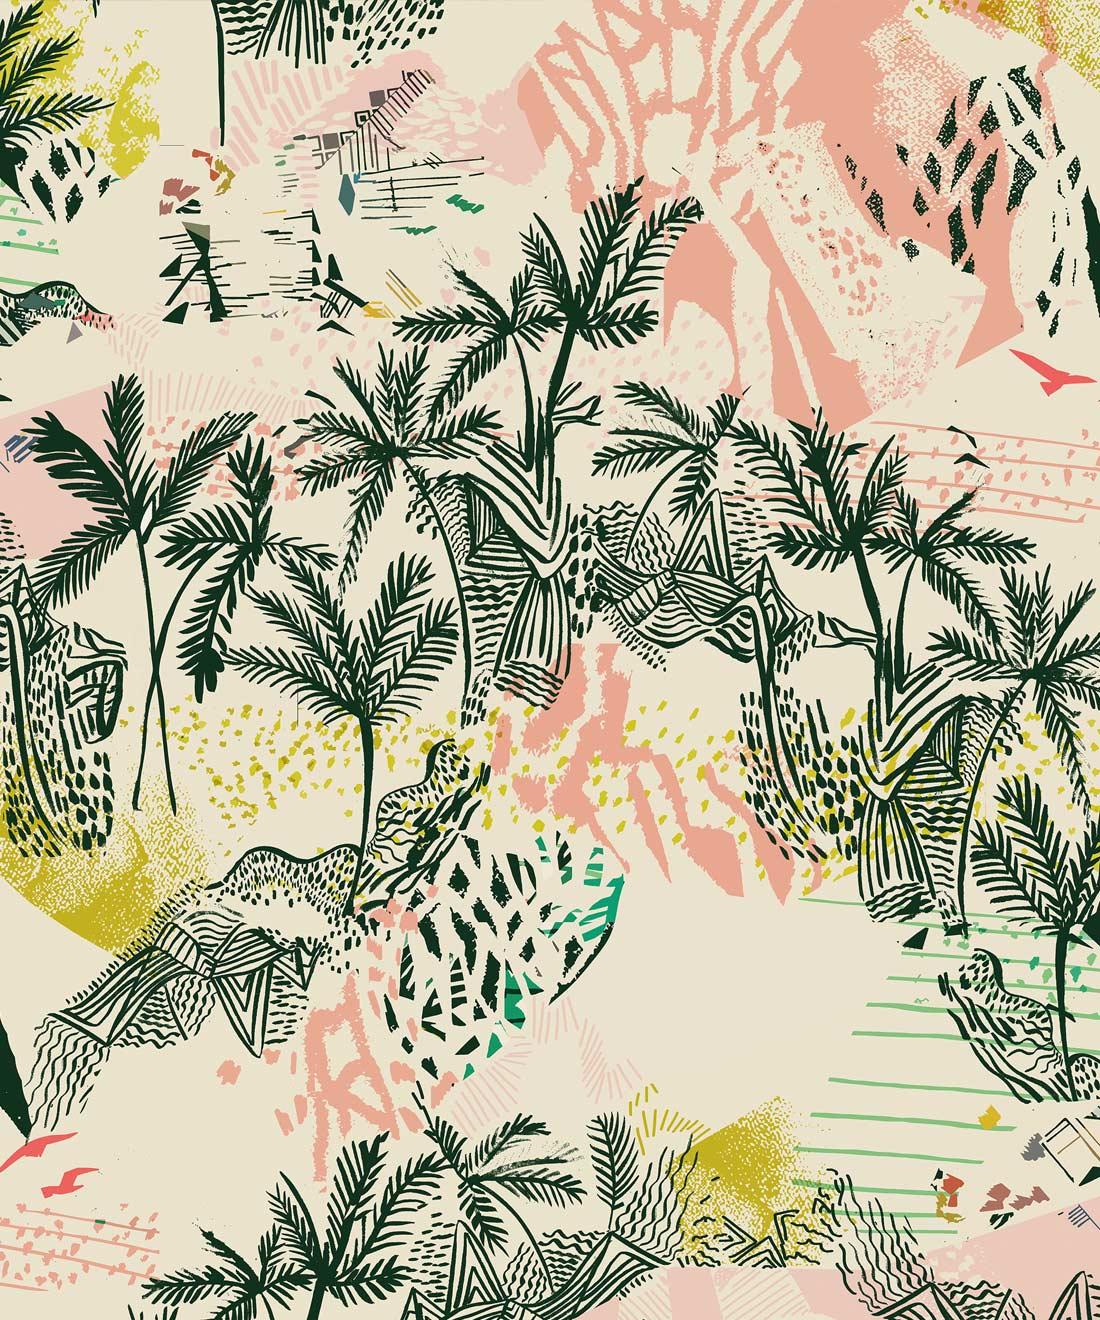 Palm Tree Design - HD Wallpaper